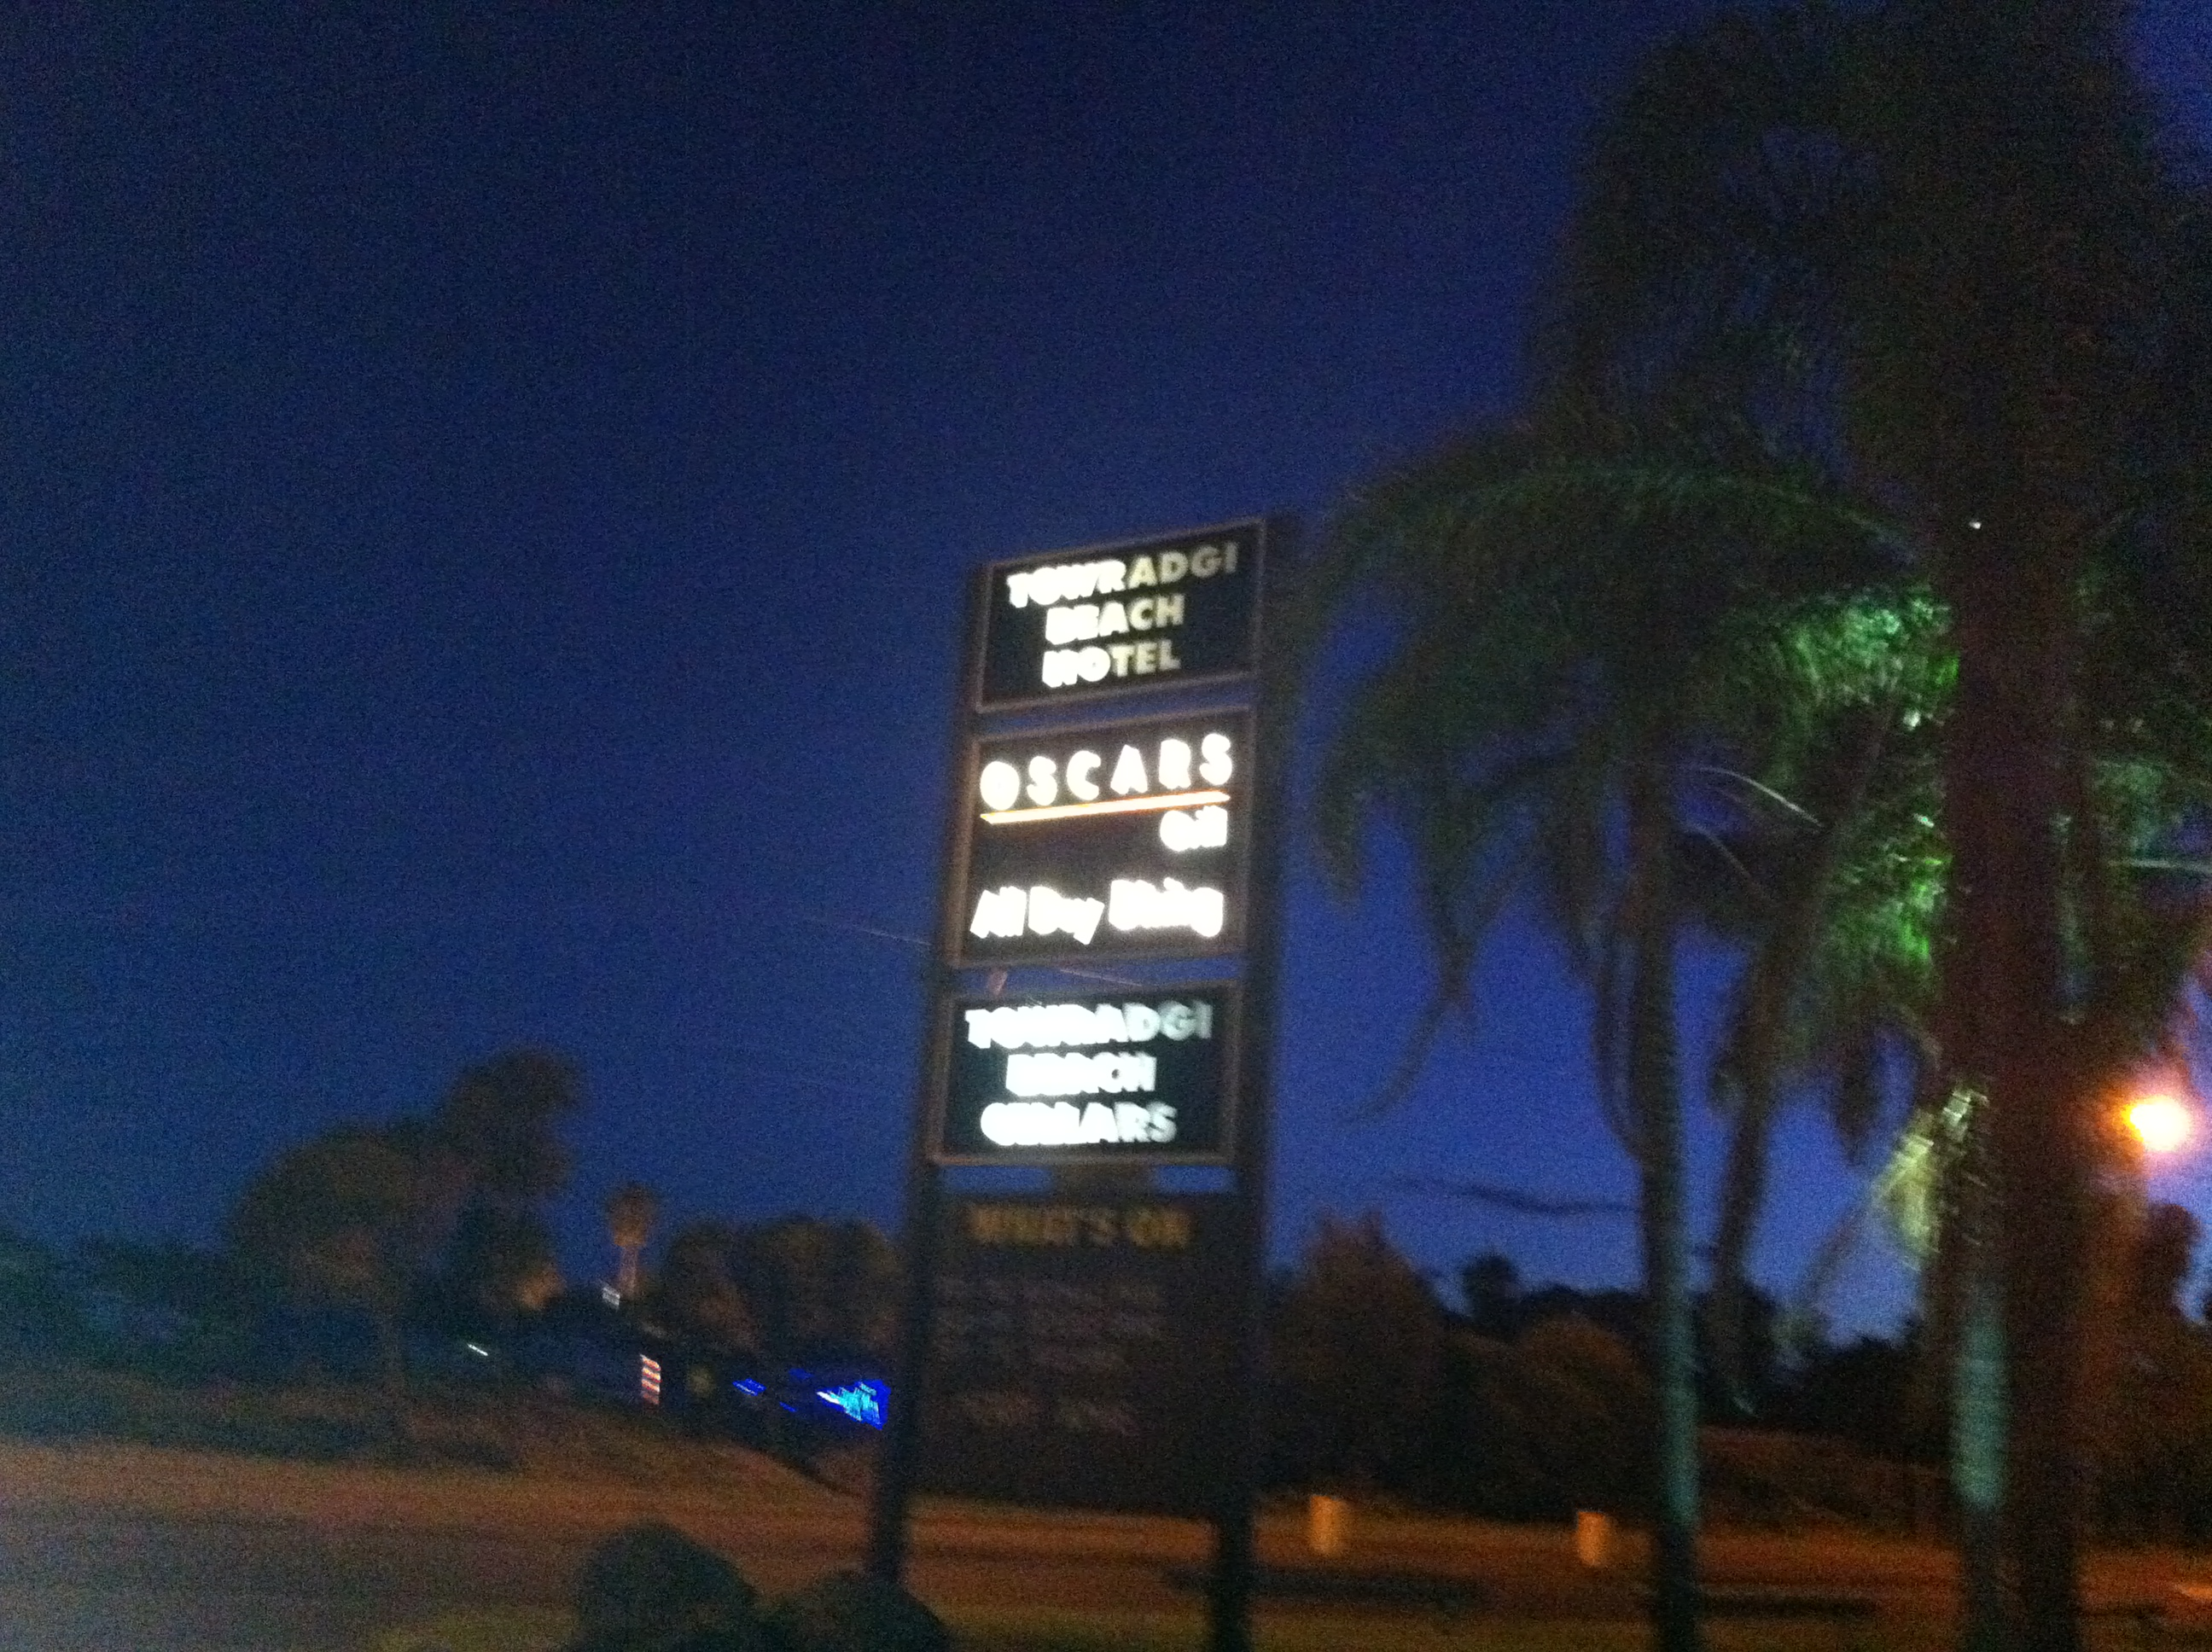 Towradgi Beach Hotel Trivia